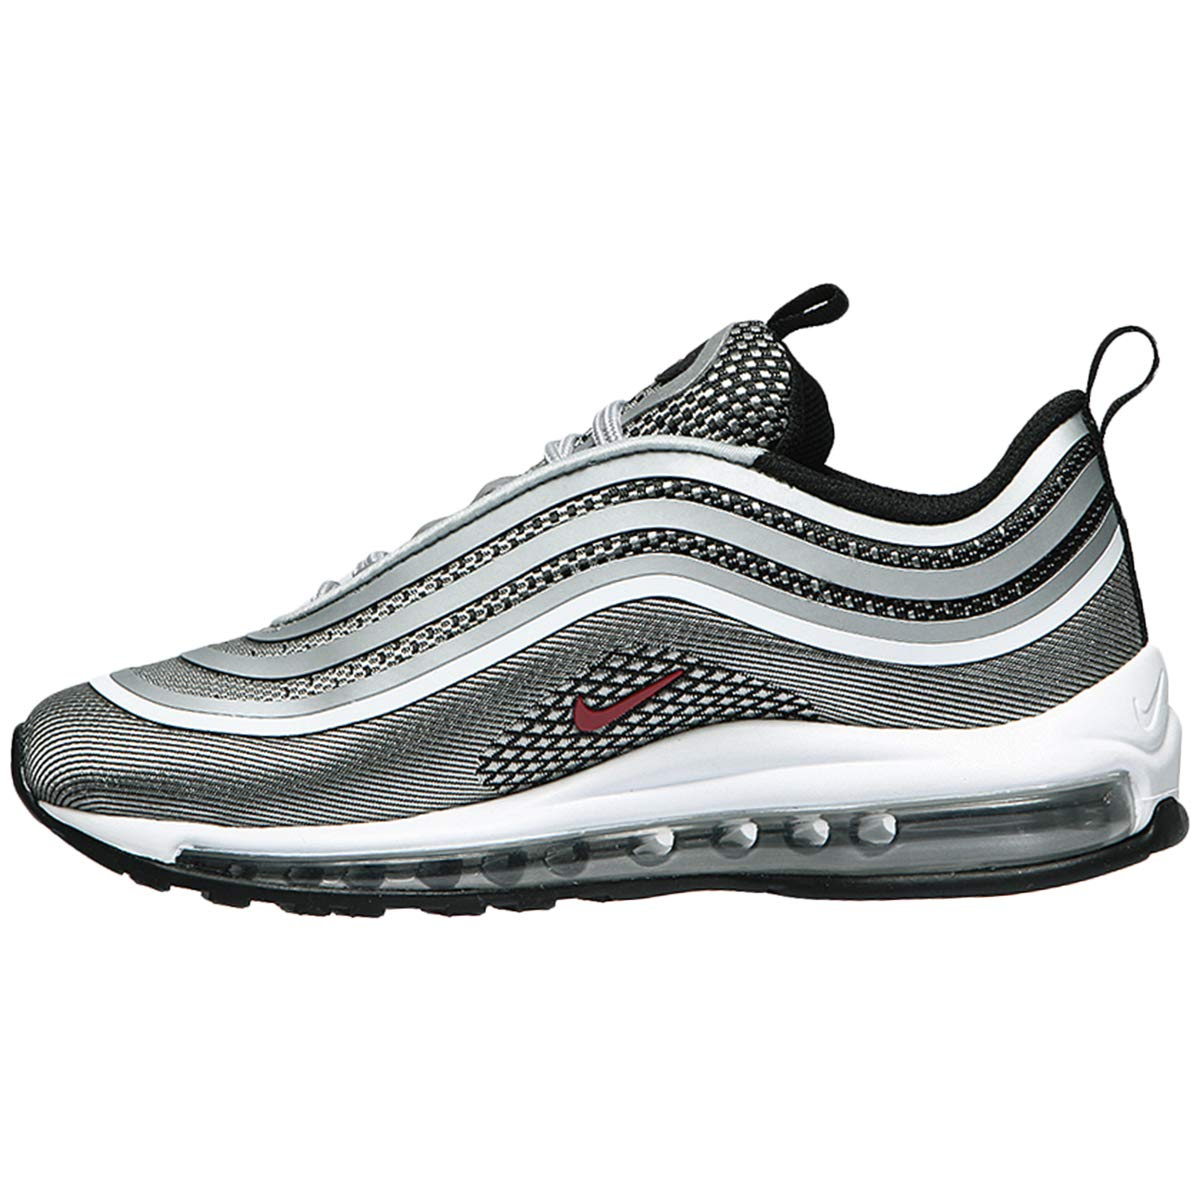 reputable site b426b 5f988 Nike Youth Air Max 97 UL 17 GS Textile Metallic Silver Formateurs 35.5 EU   Amazon.fr  Chaussures et Sacs